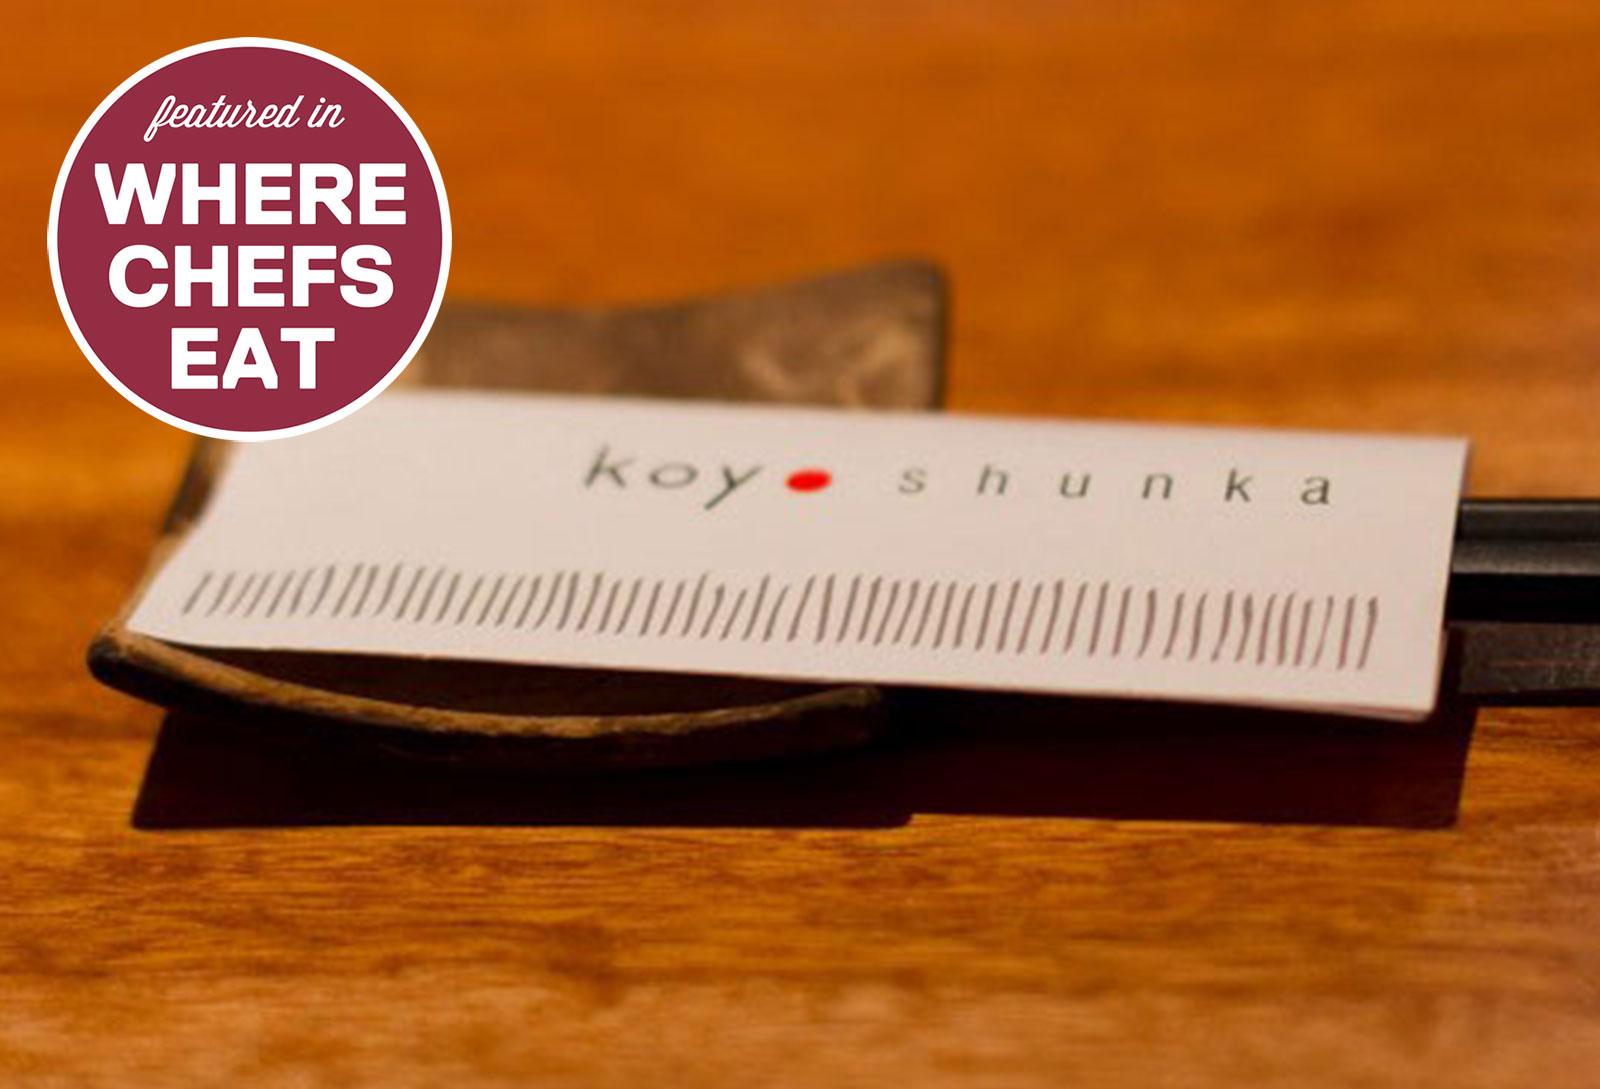 Koy Shunka - recommended in Where Chefs Eat